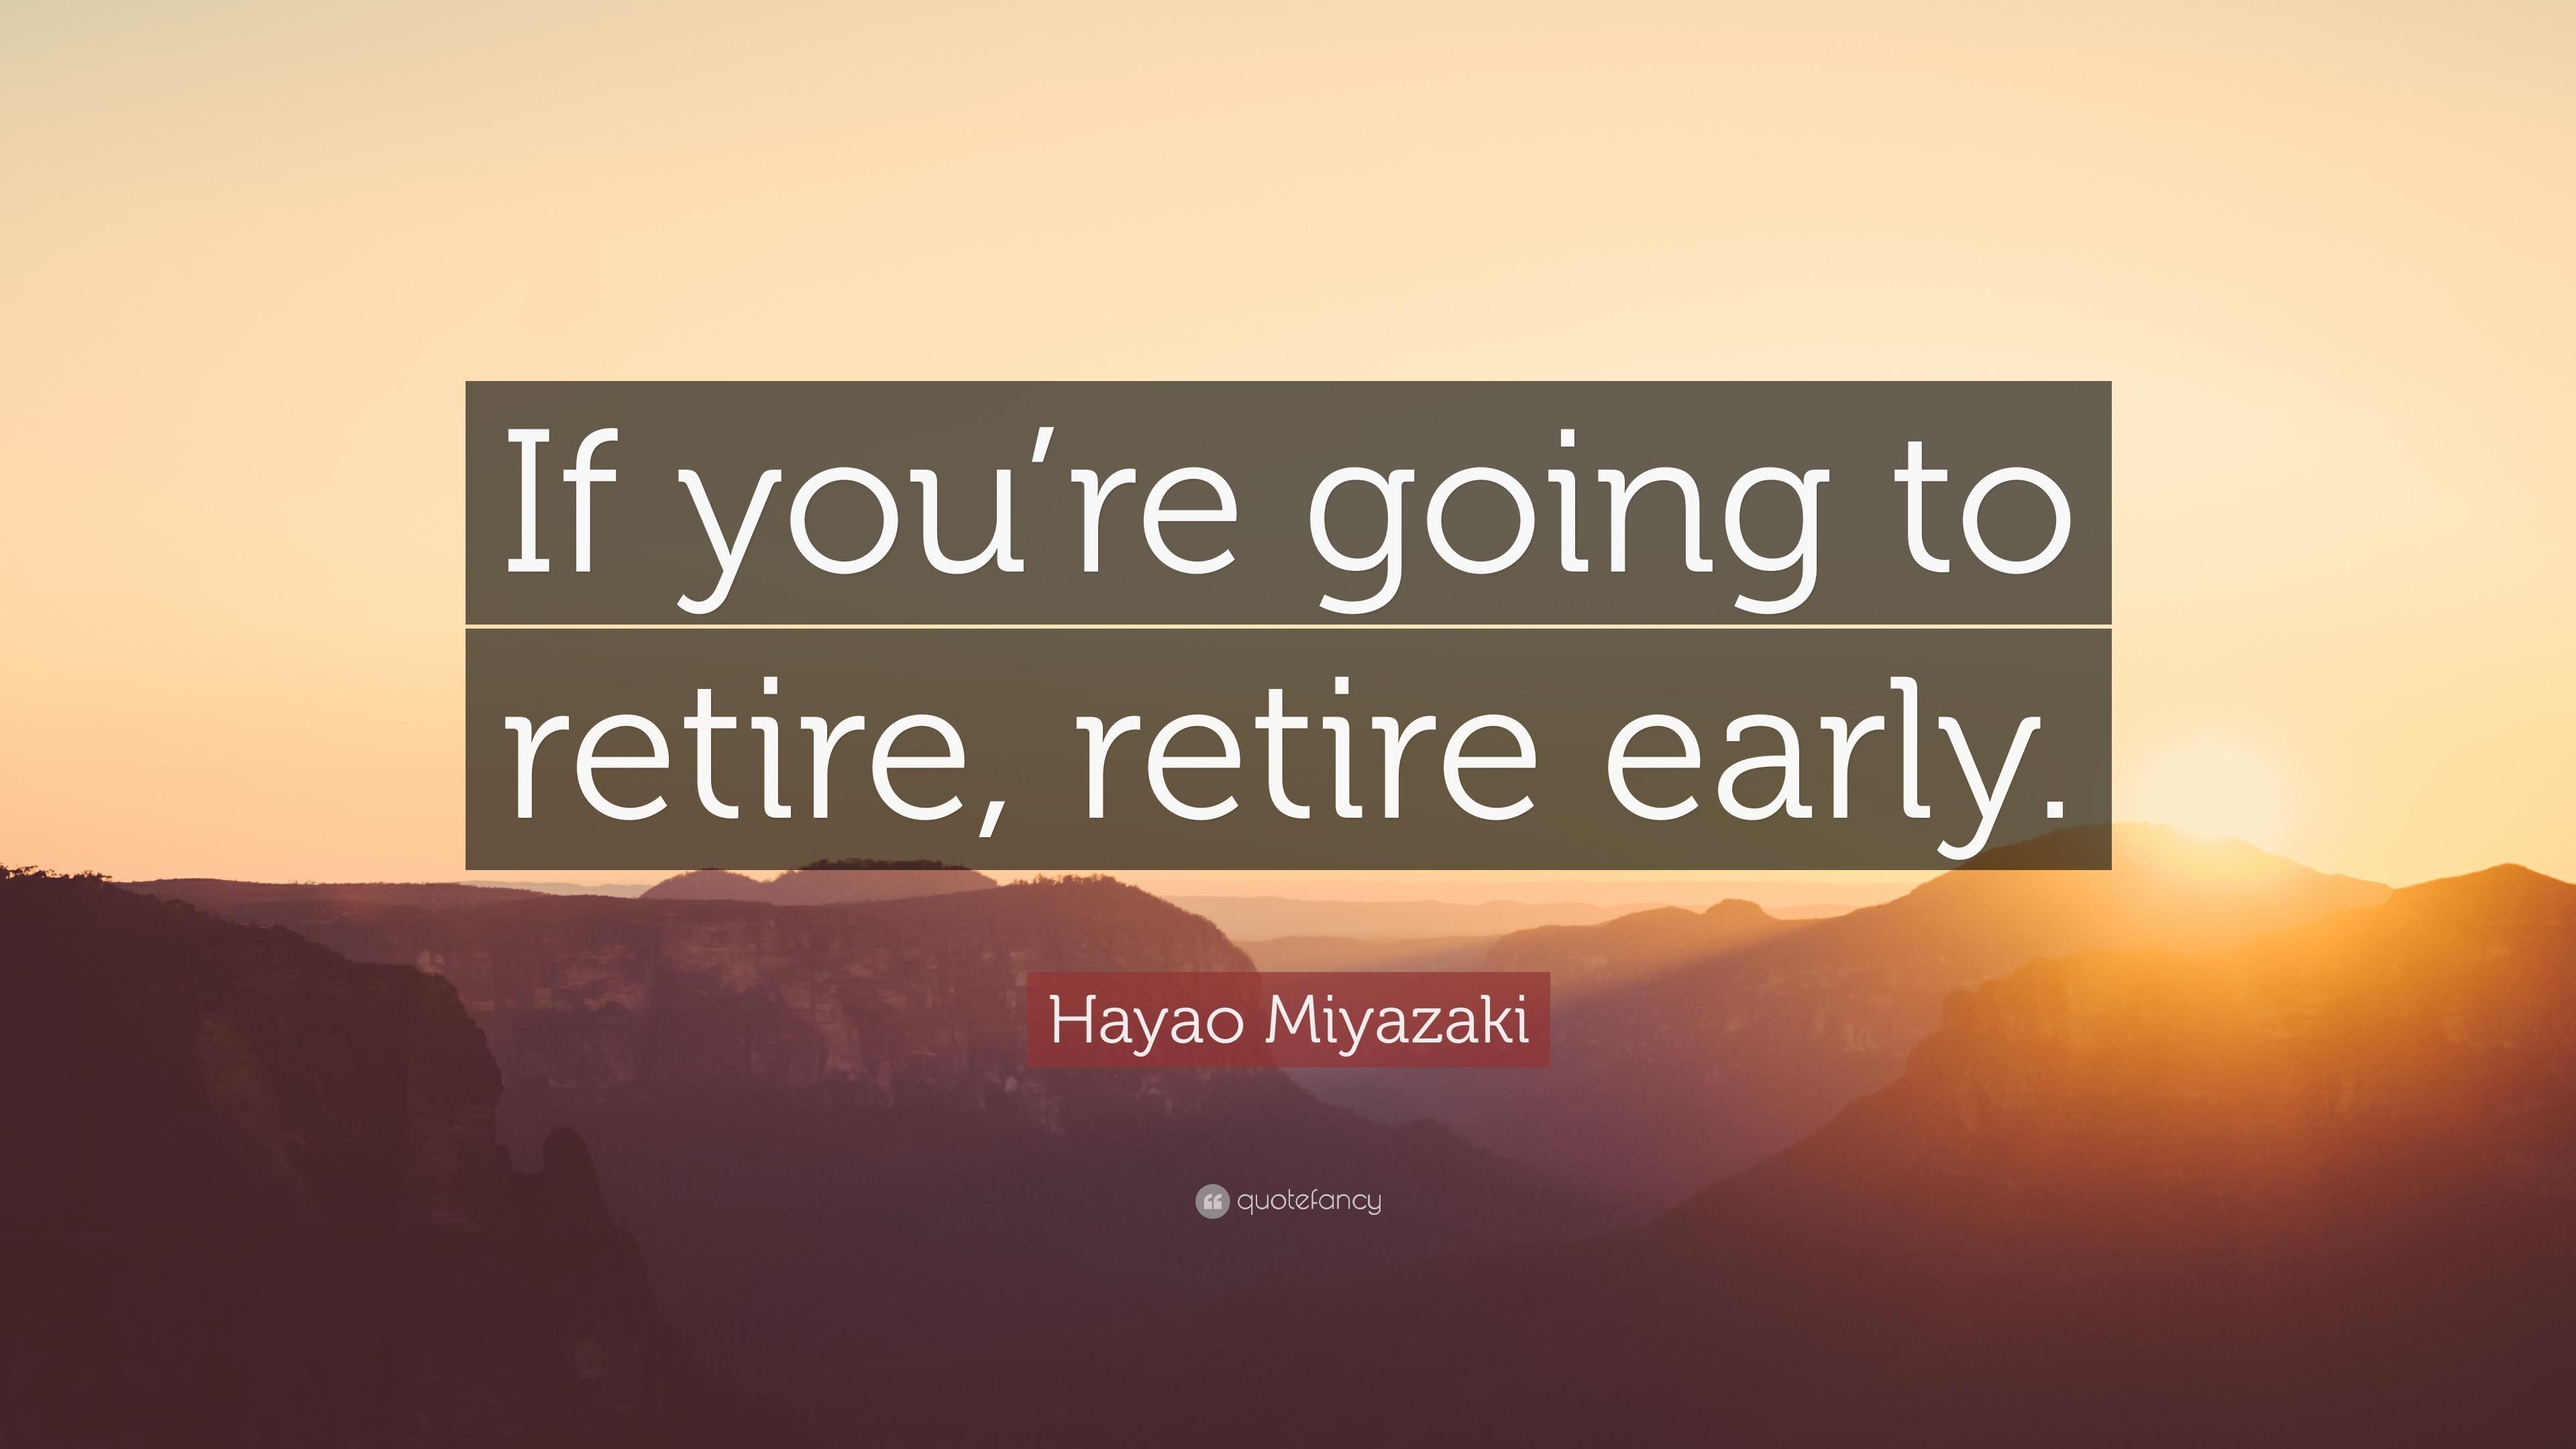 Hayao Miyazaki Quotes 79 Wallpapers